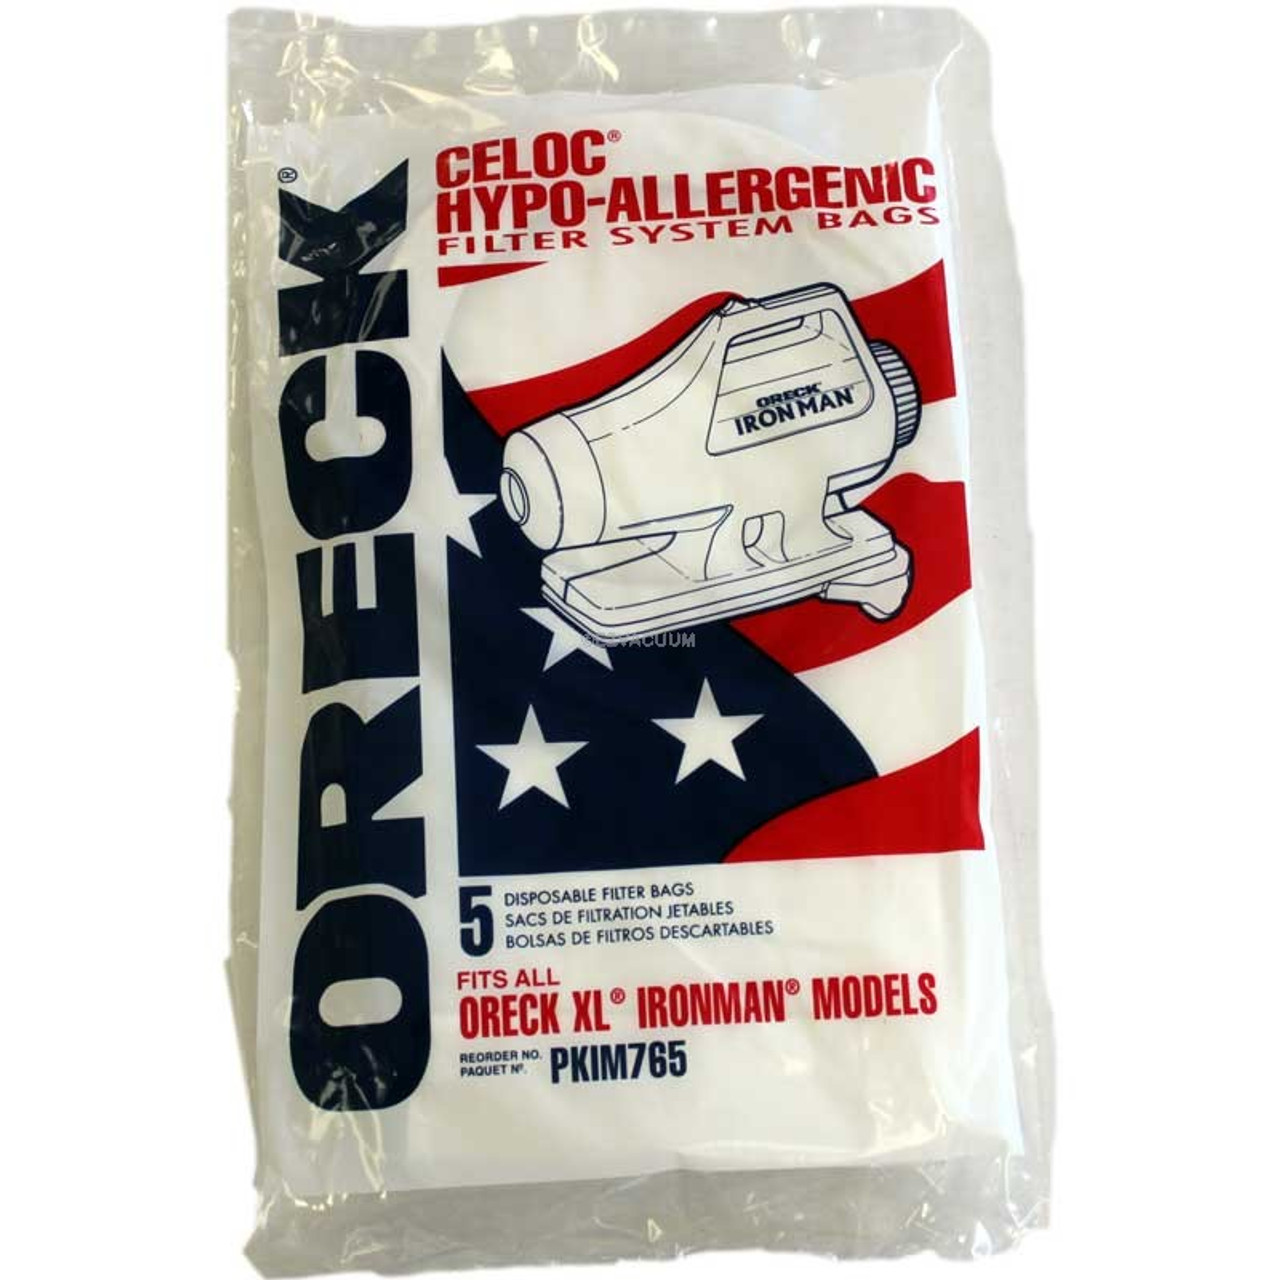 Oreck CC /& all XL Upright Models set 8 Bags /& 1 Brush /& 3 Belts /& 8 Scent Tabs